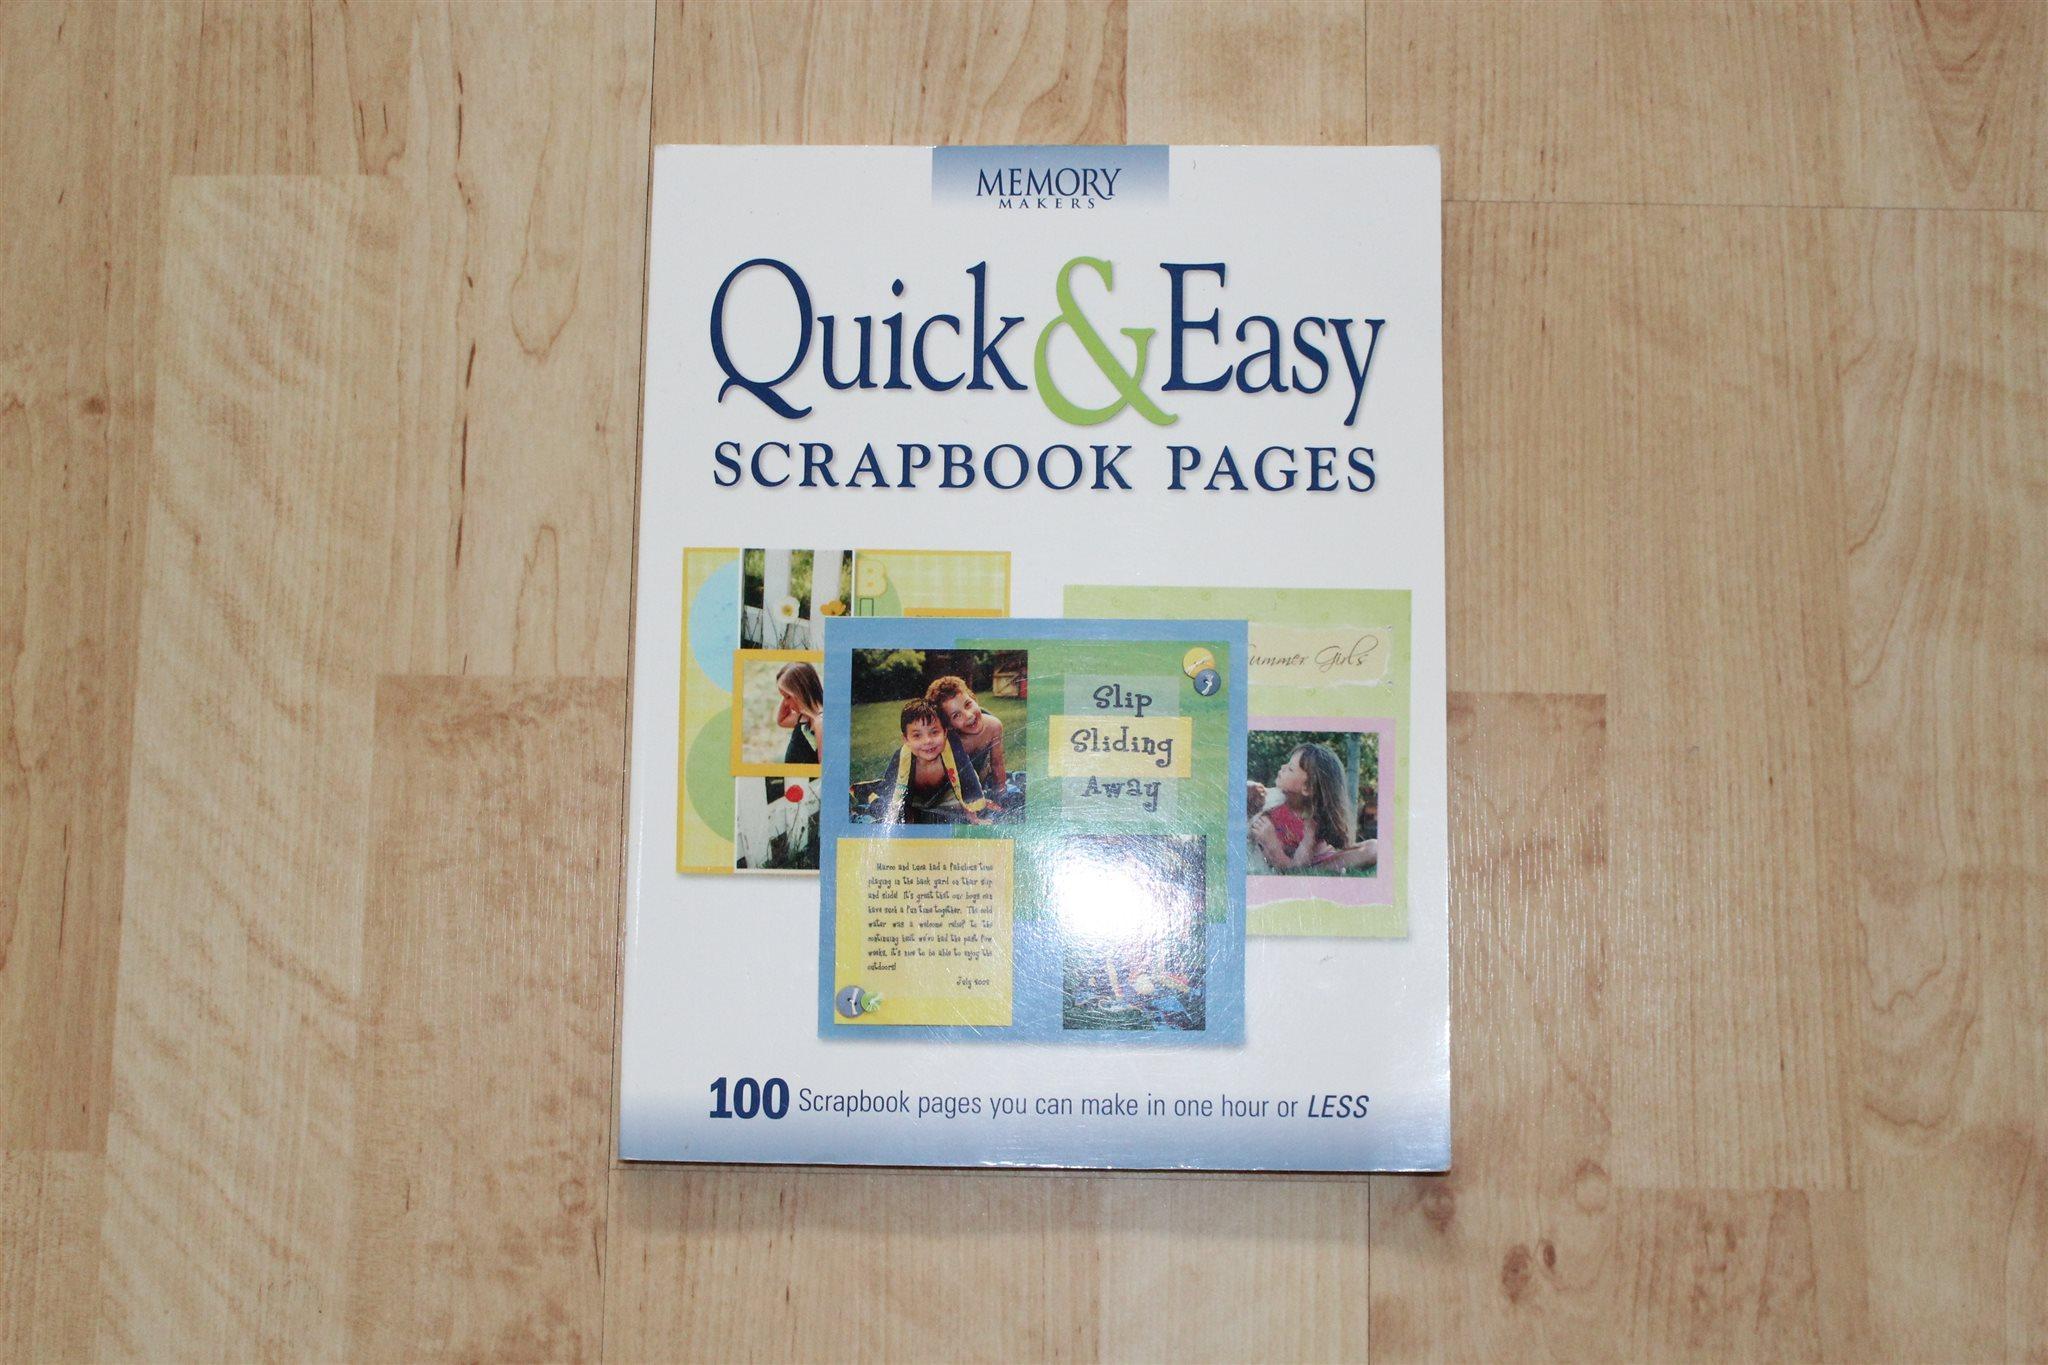 Quick easy scrapbook ideas - Quick Easy Scrapbook Pages